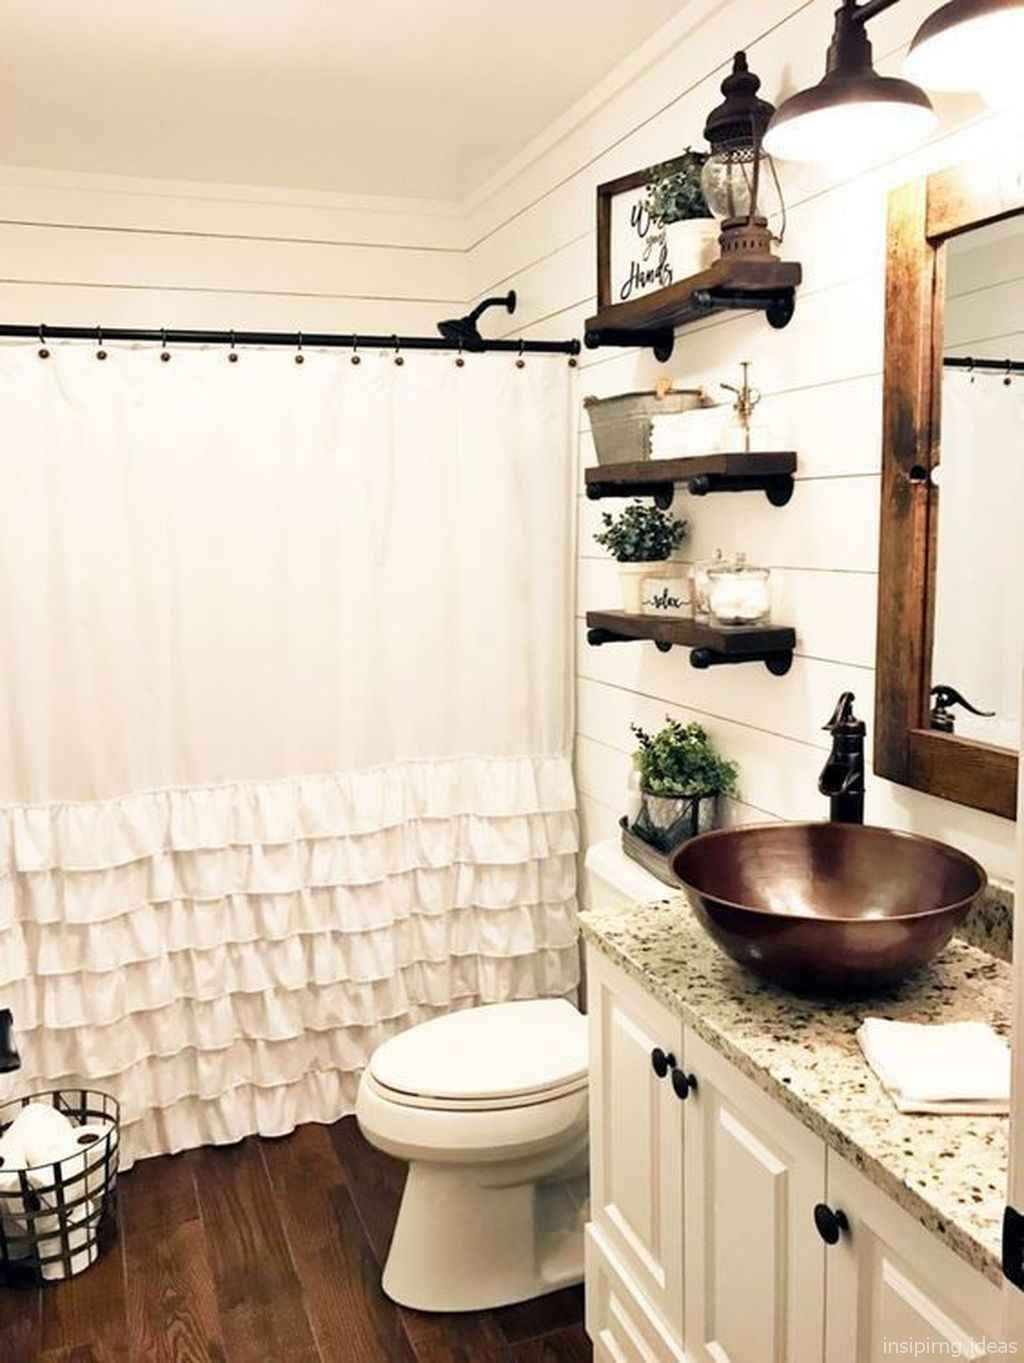 50 modern farmhouse small bathroom wall color ideas 1 in on home inspirations this year the perfect dream bathrooms diy bathroom ideas id=31783